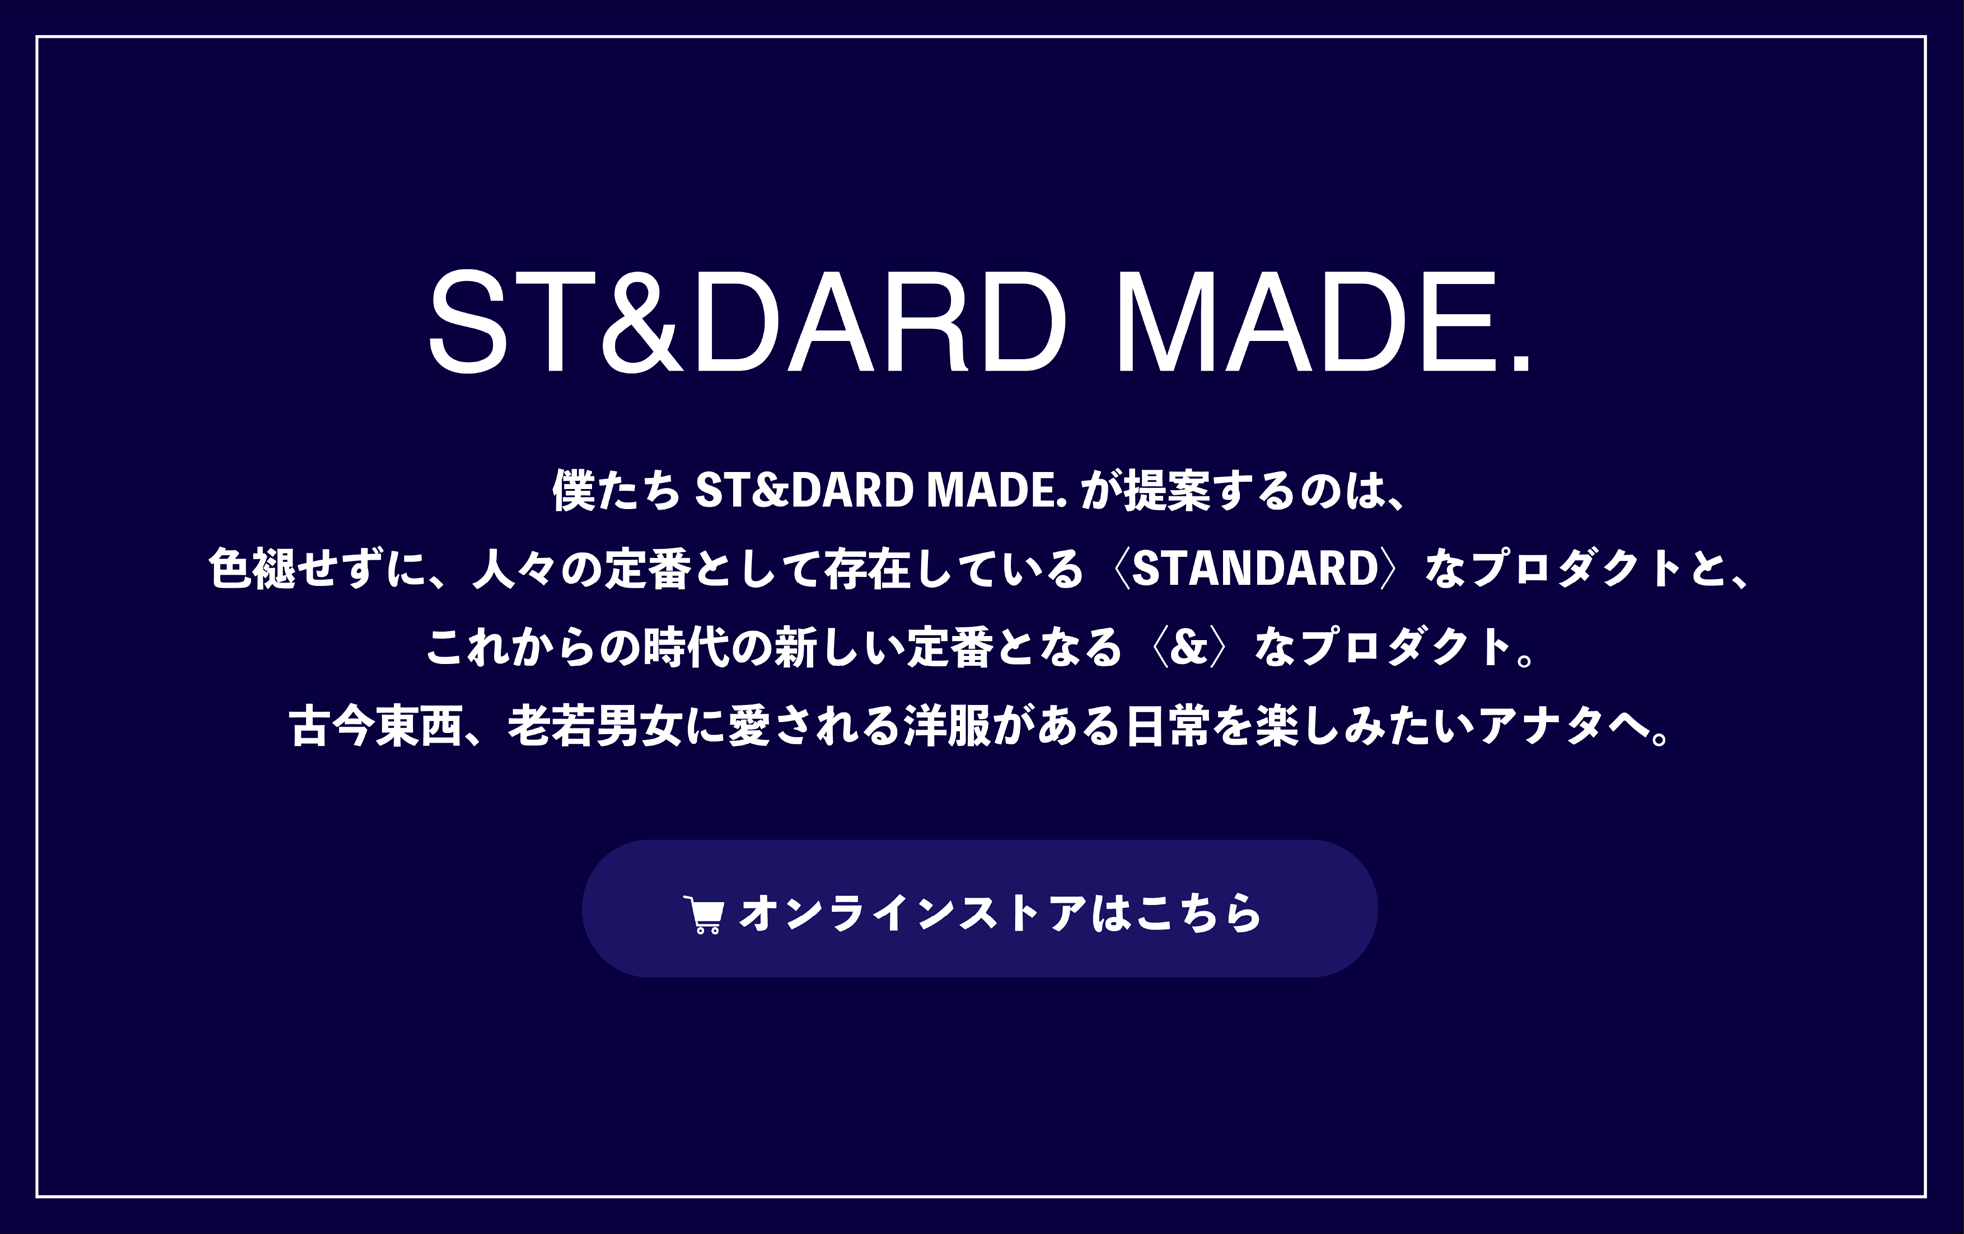 ST&DARD MADE